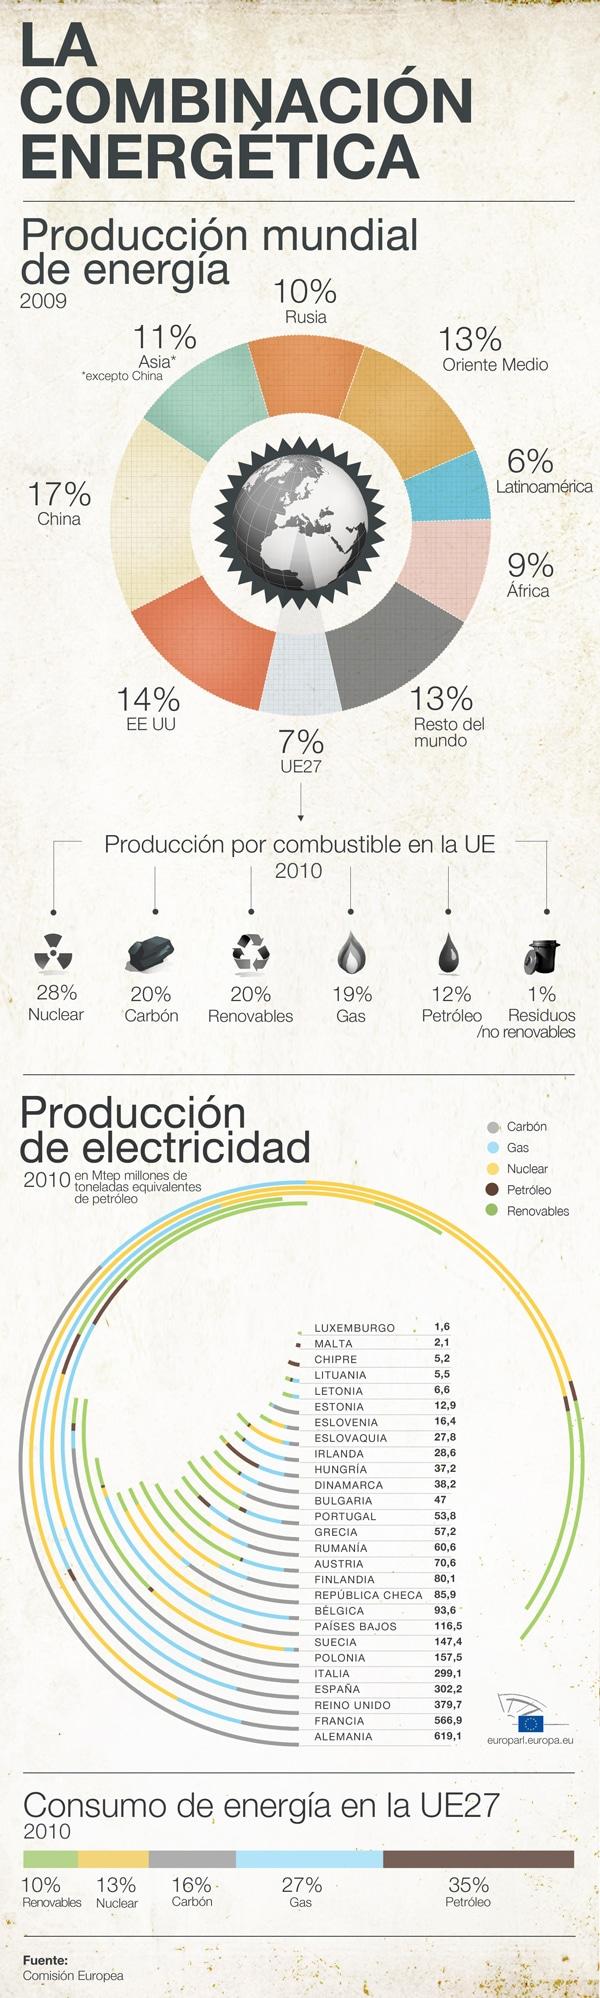 infografia produccion de energia europa